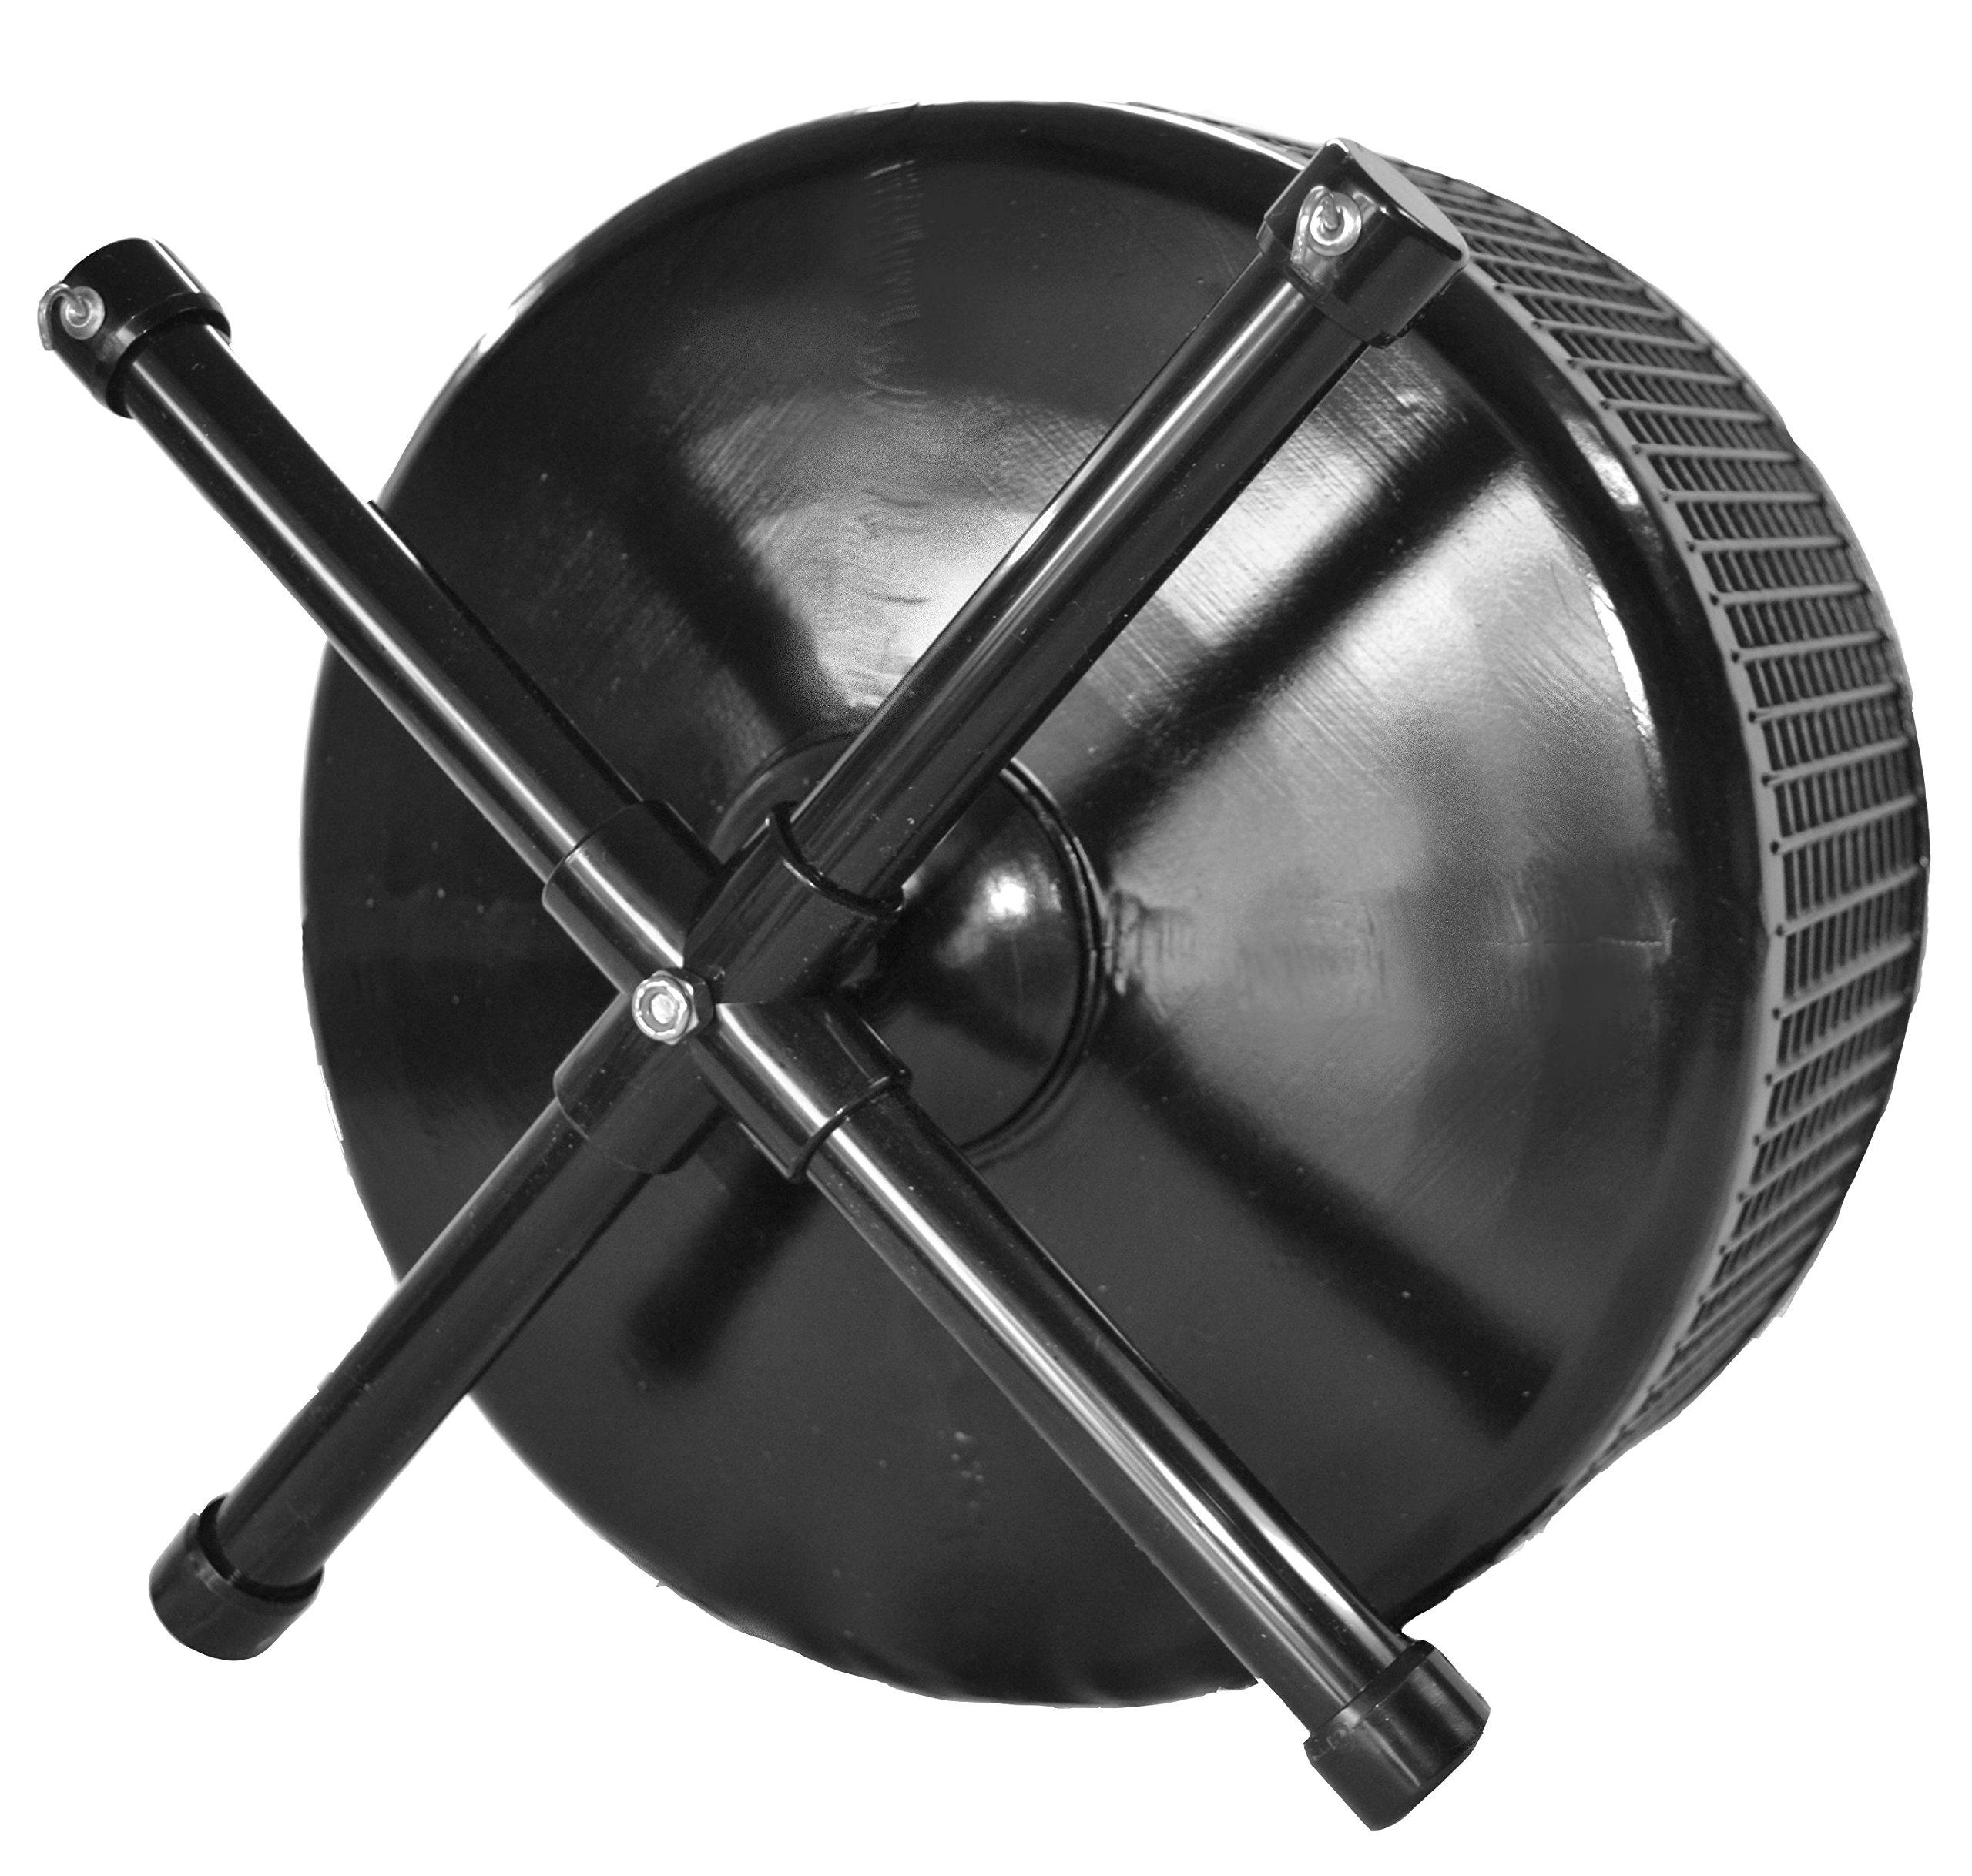 Atticworx Sugar Glider Wheel-12 inch Stealth Freedom 19 Wheel; Black with Cage Side Mount by Atticworx